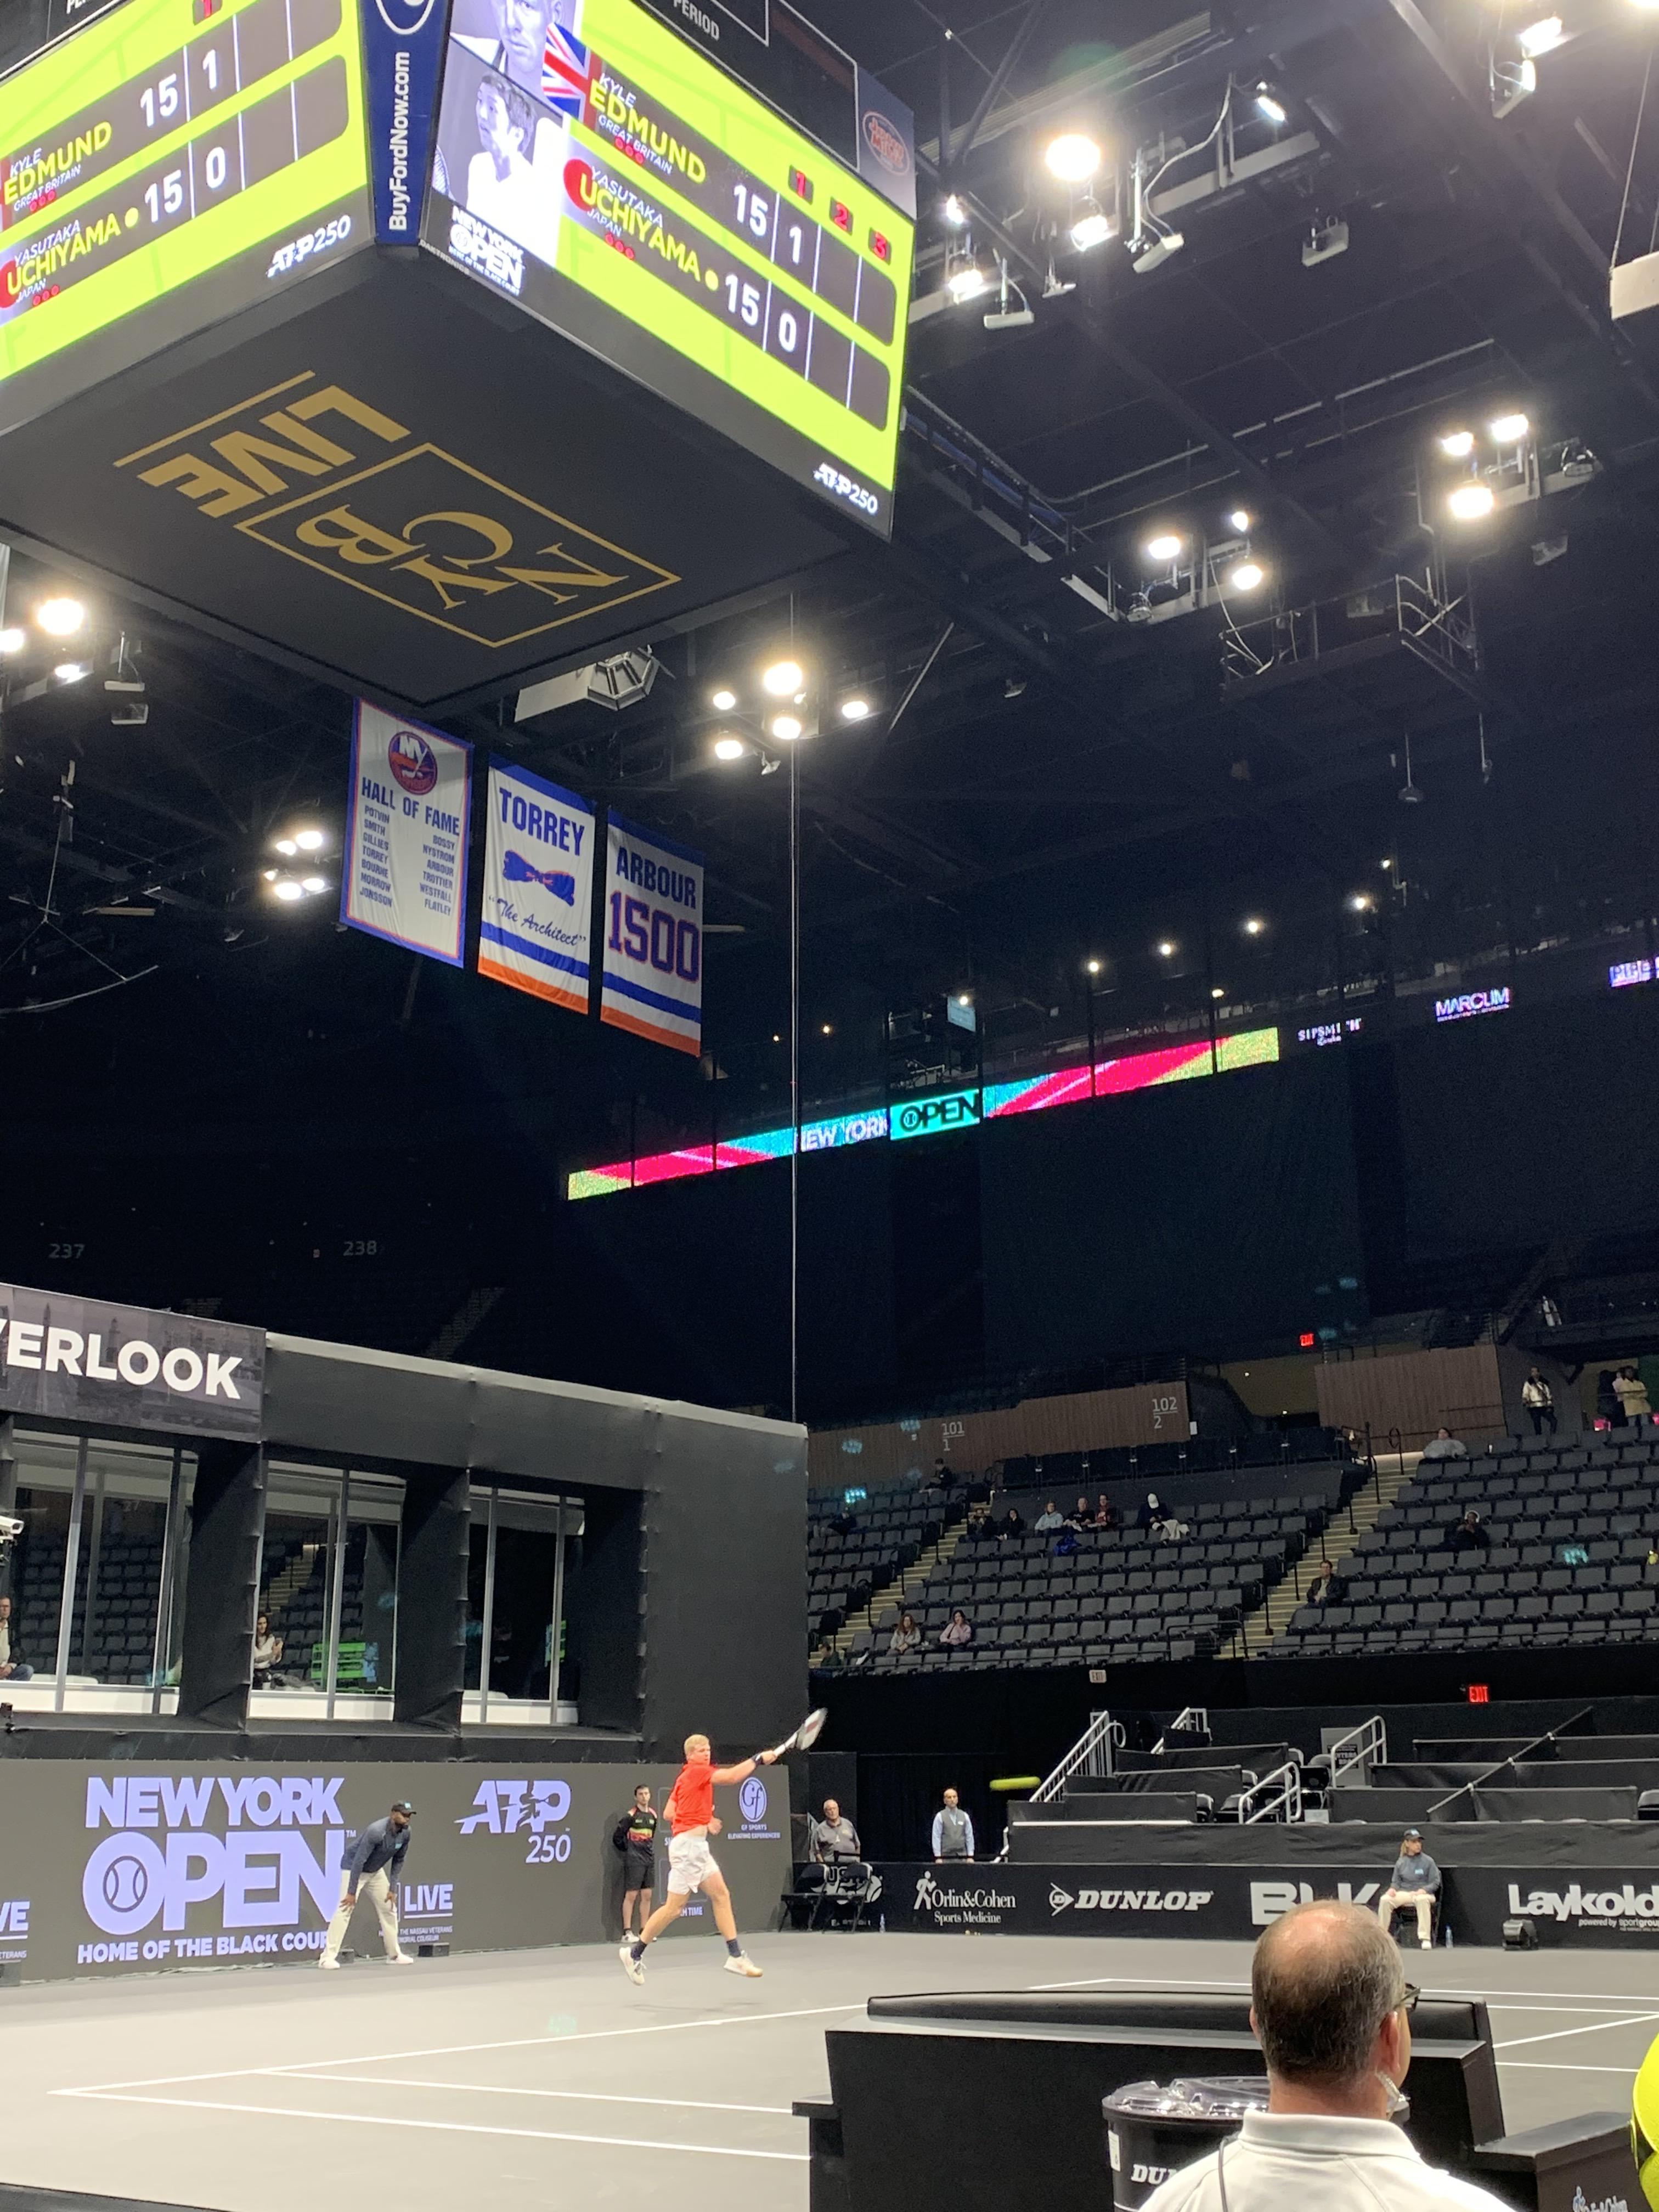 Kyle Edmund, 2020 New York Open (Photo: TennisAtlantic.com)